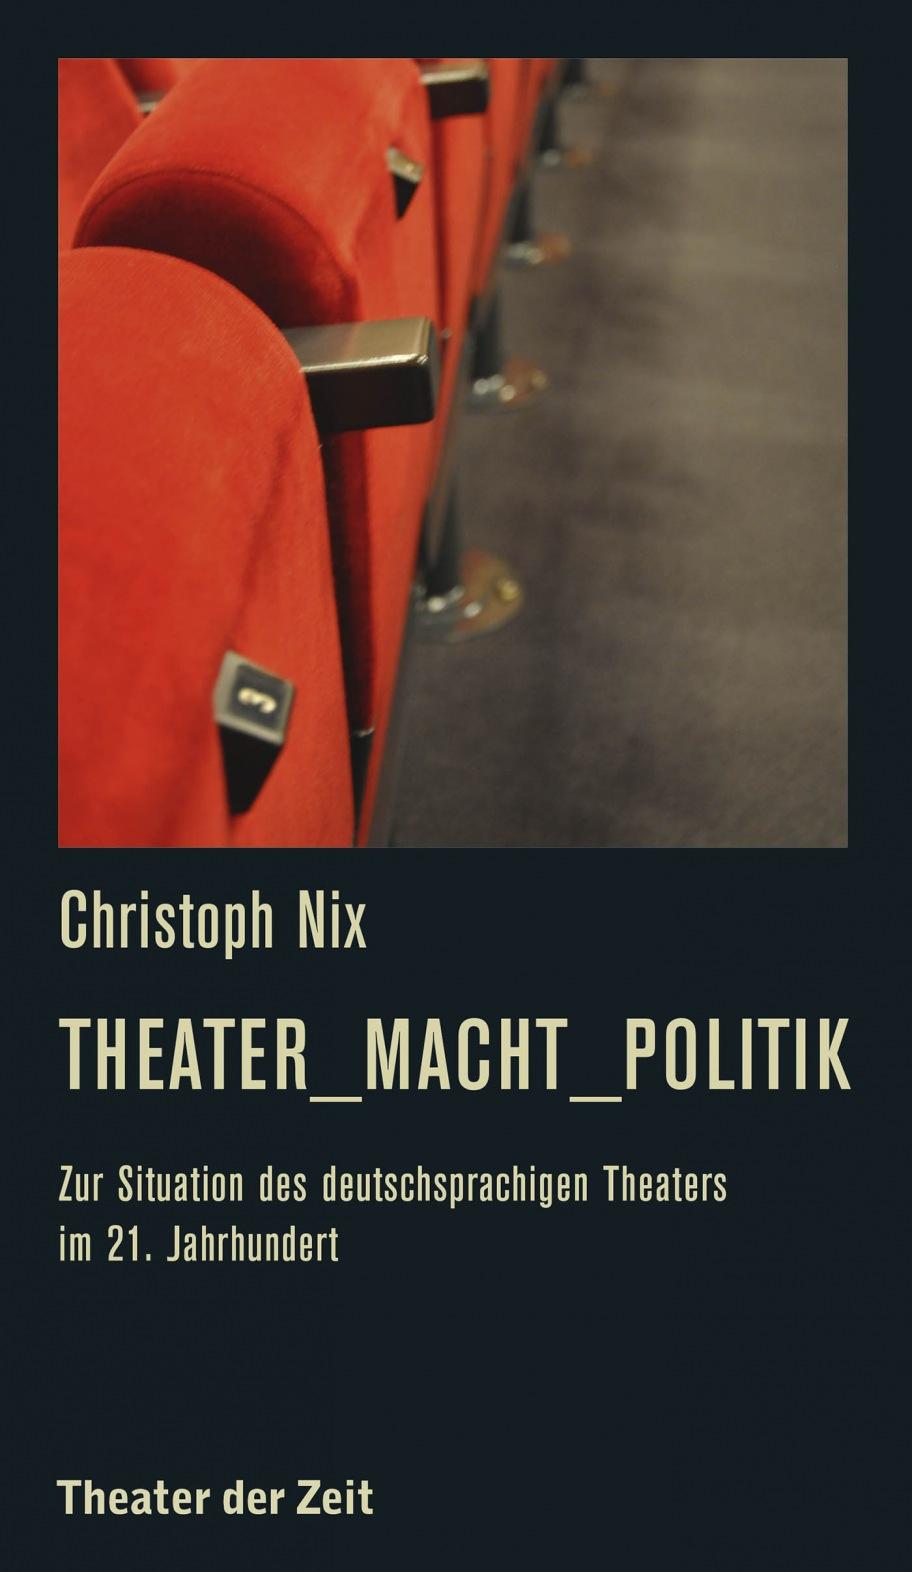 Christoph Nix: Theater_Macht_Politik